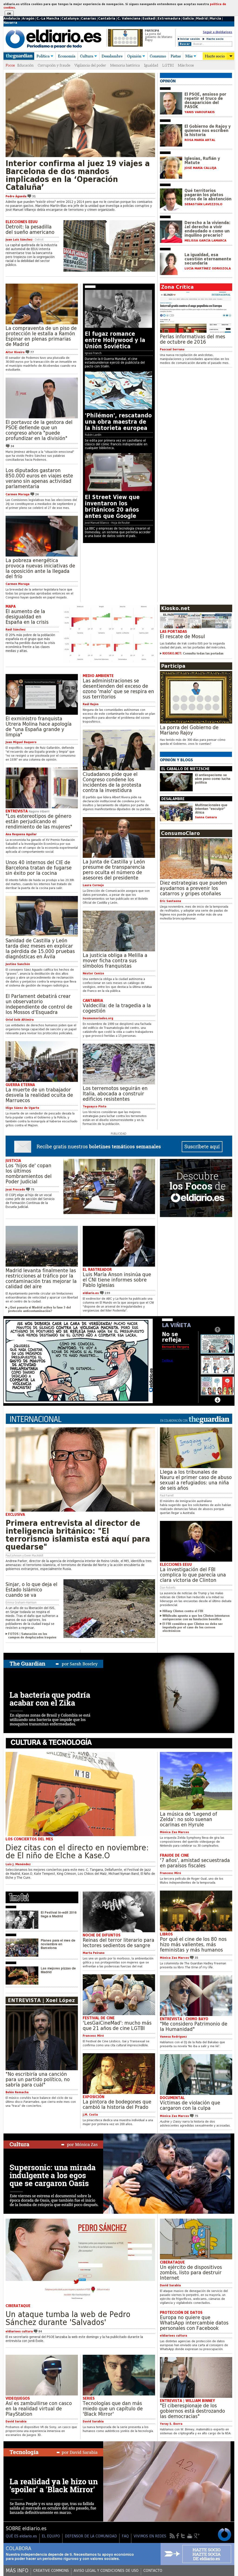 El Diario at Wednesday Nov. 2, 2016, 12:04 p.m. UTC